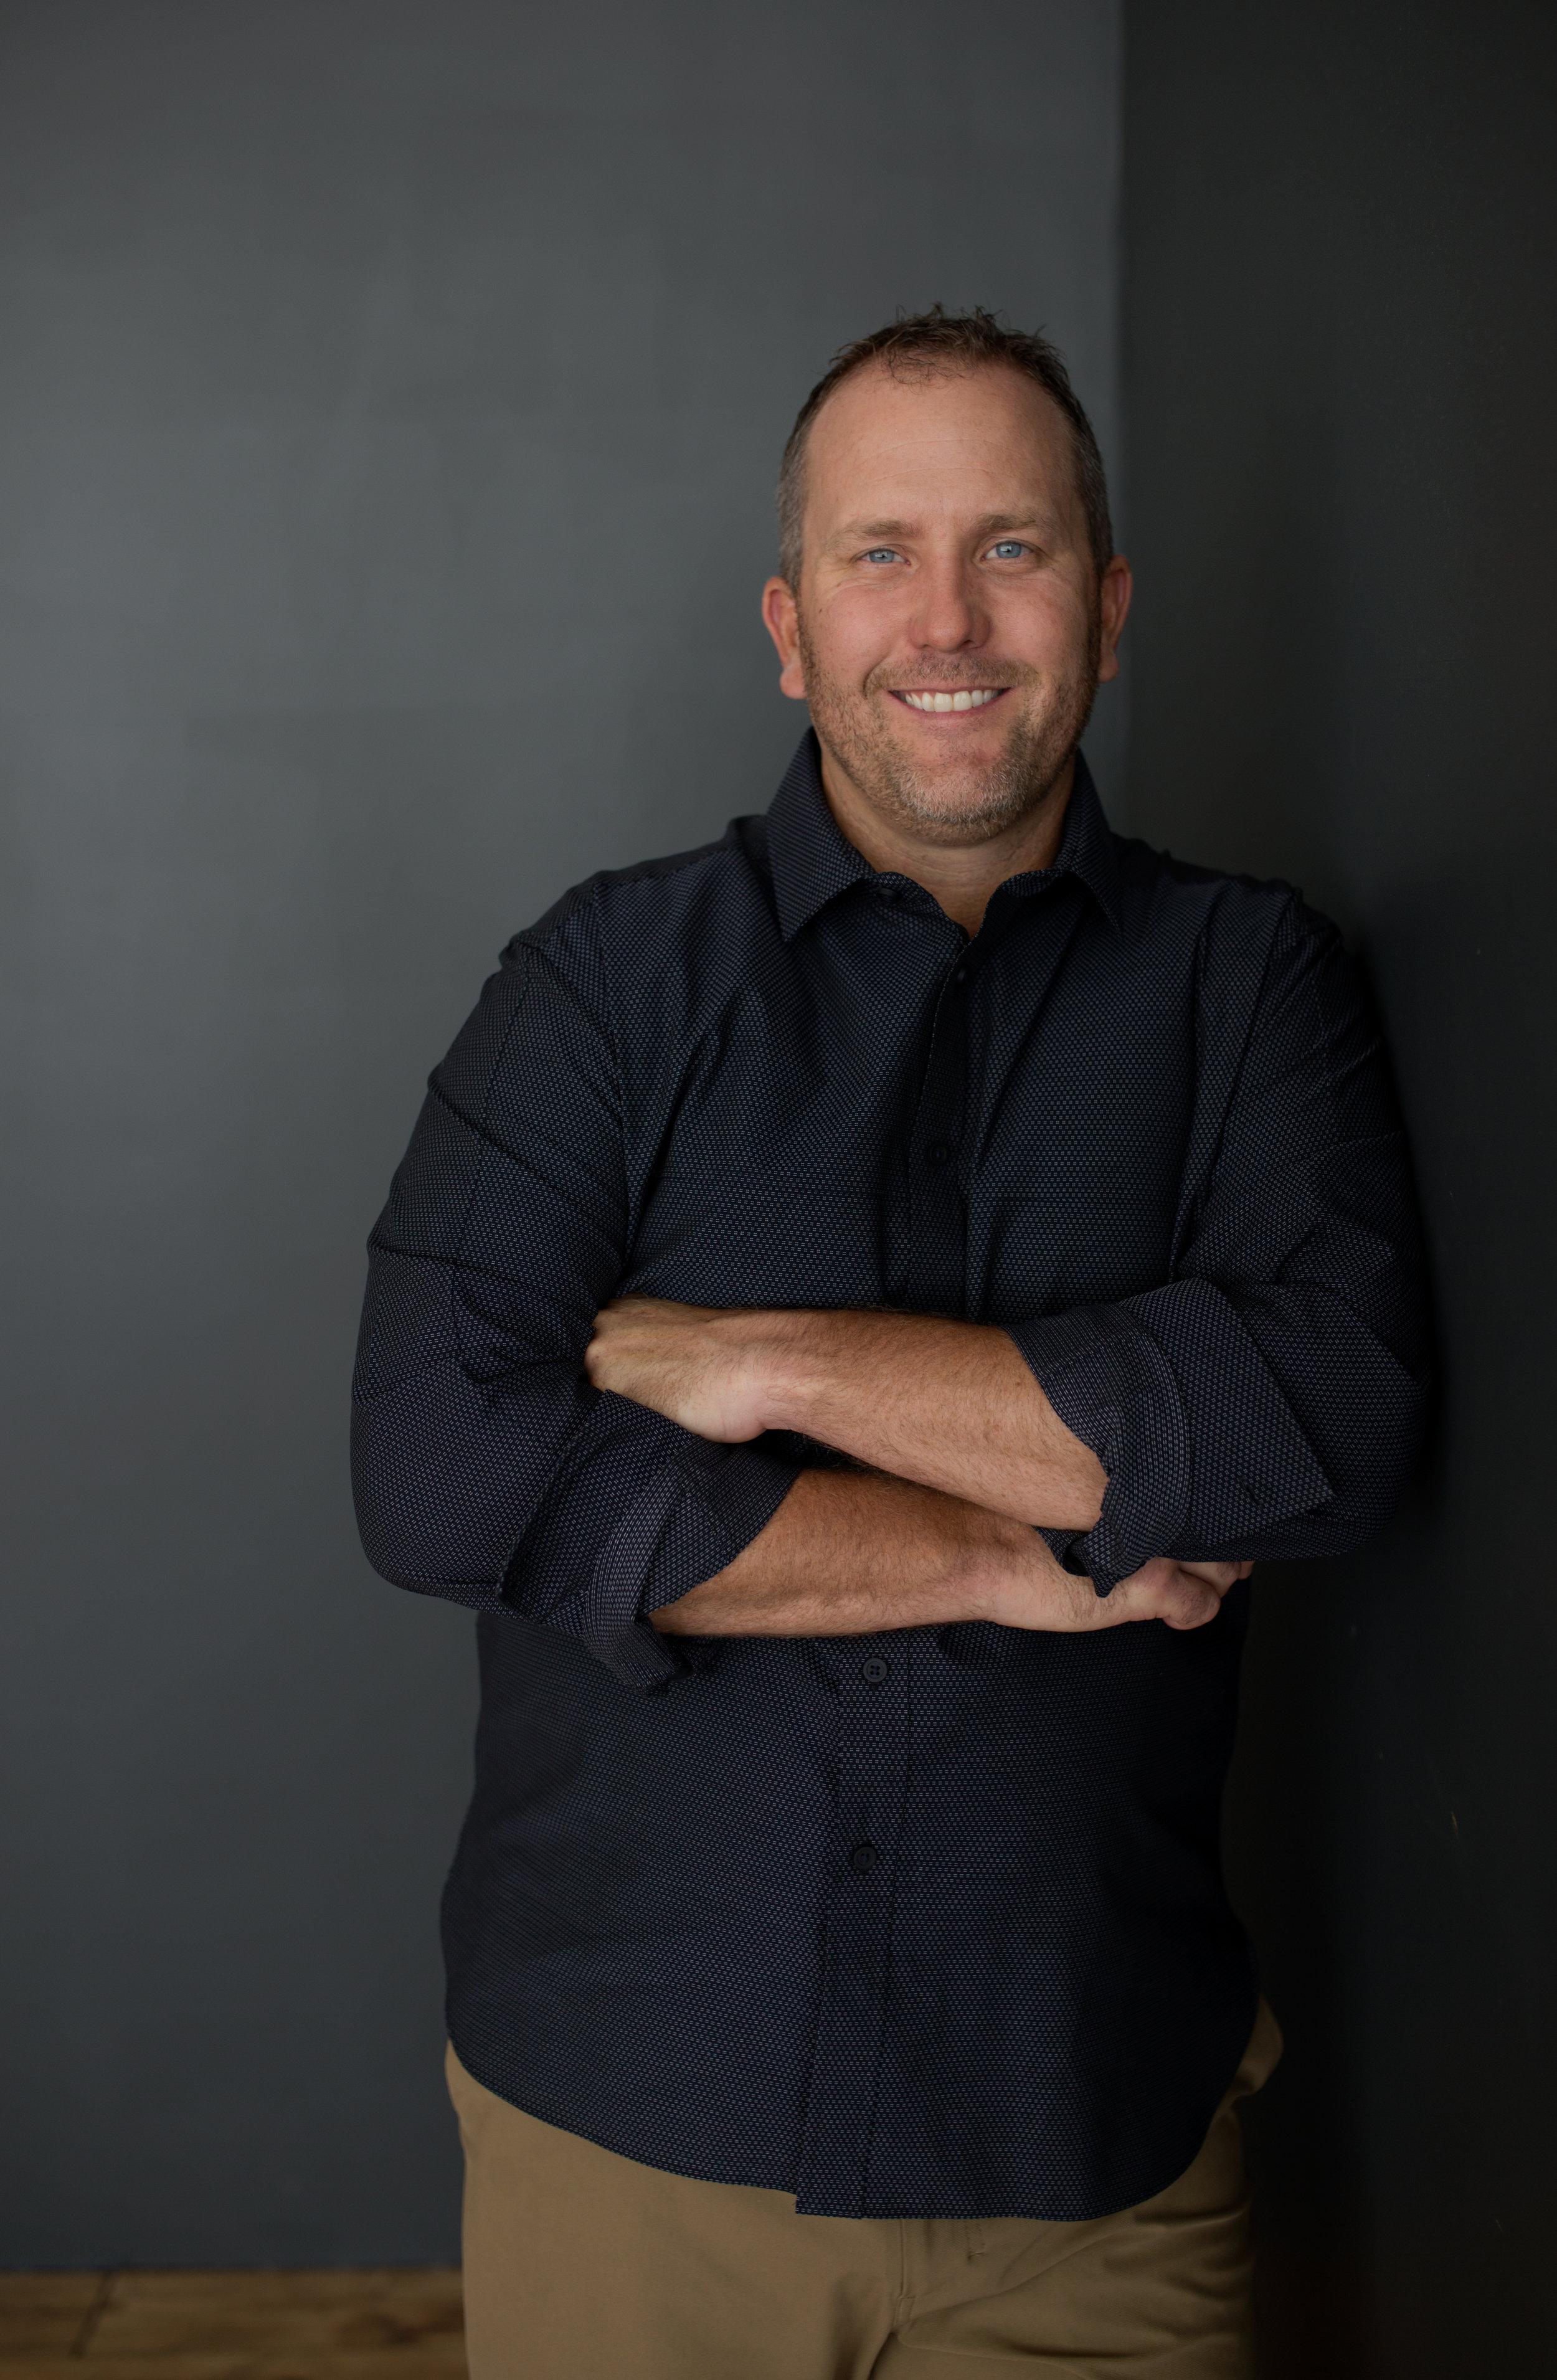 Todd Beran - Account Managertberan@evolvebenefitsne.comOffice: 402.933.3499 x2